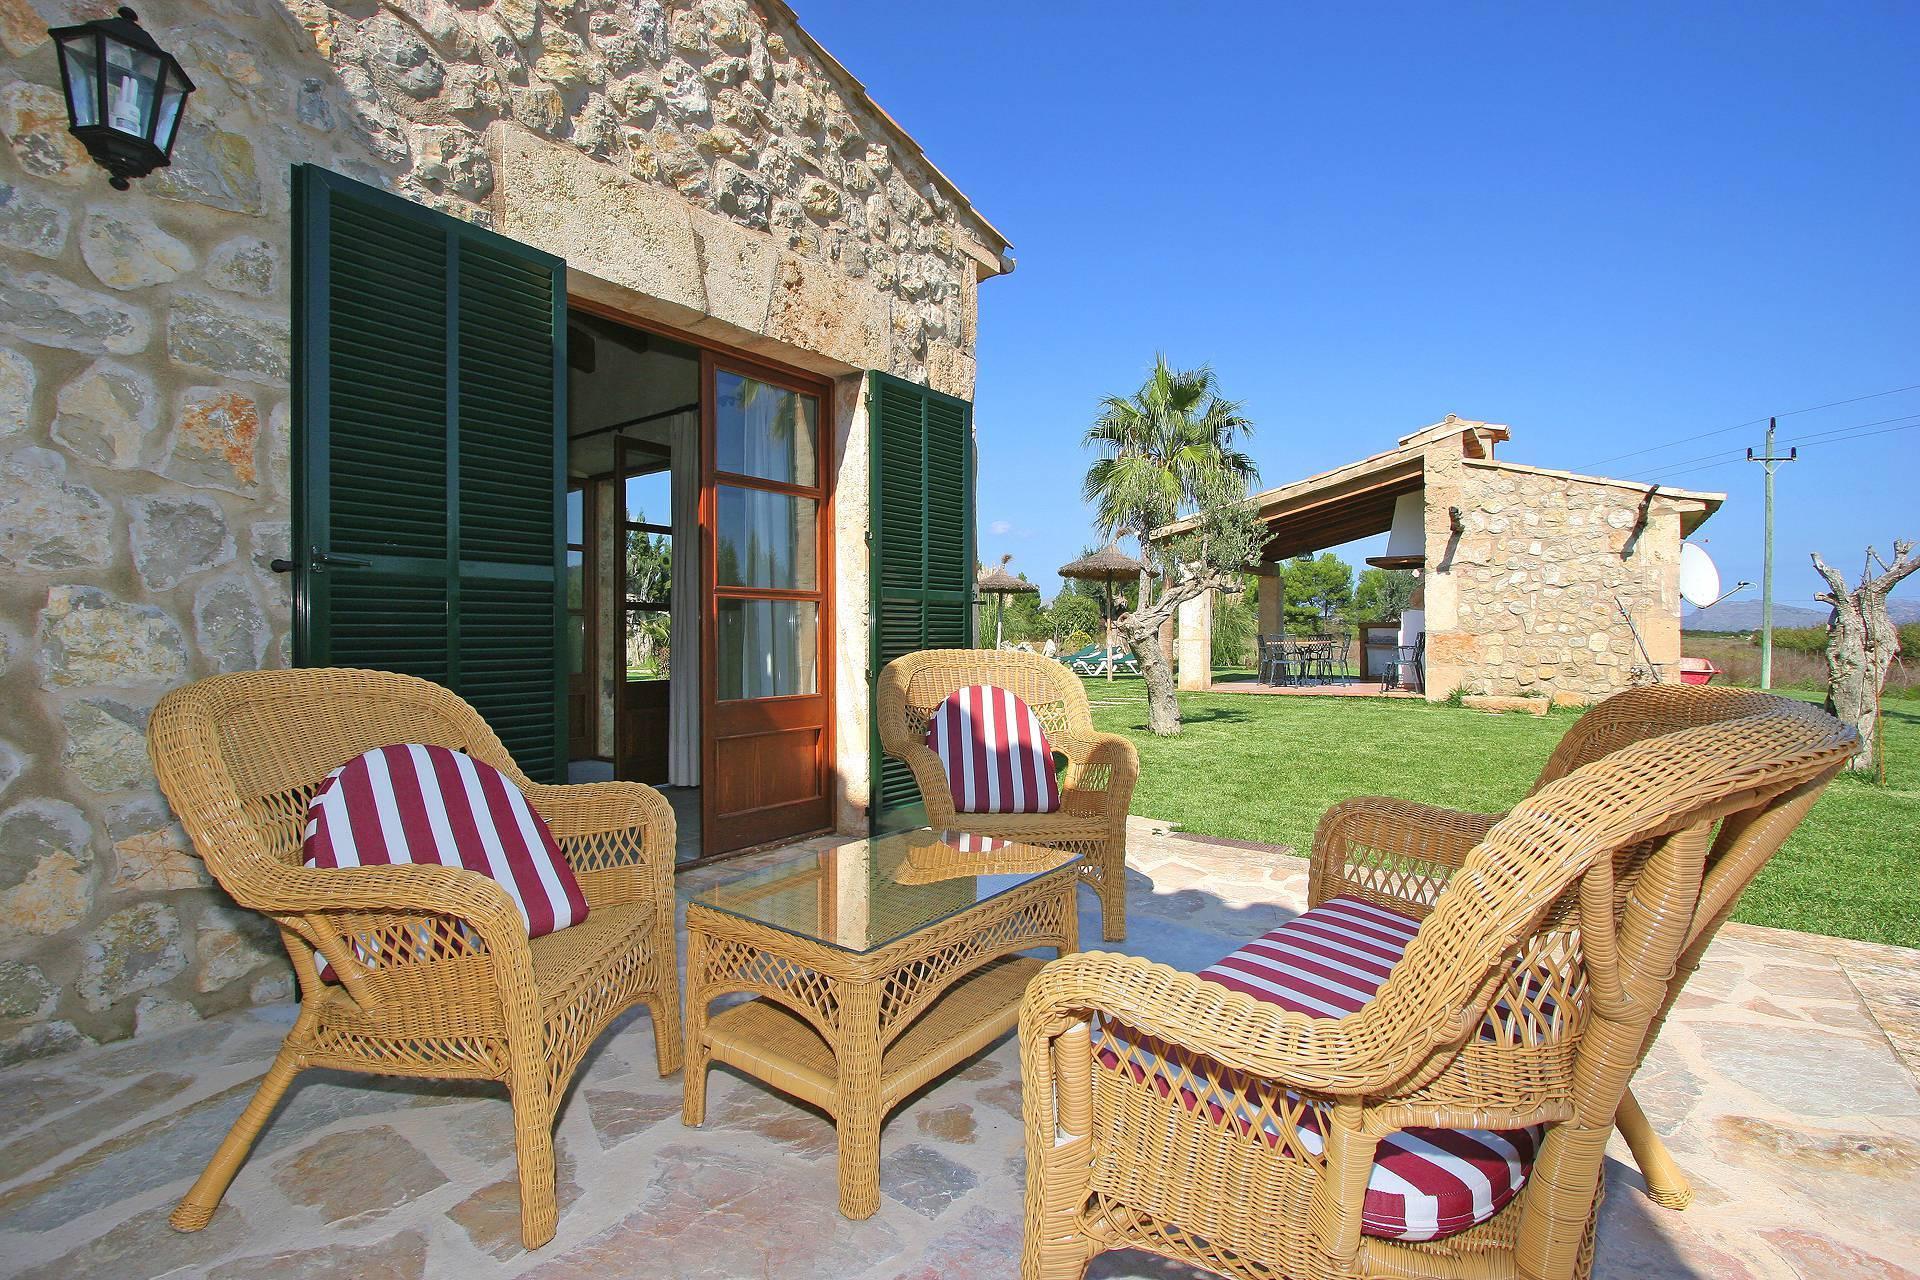 01-55 Familienfreundliche Finca Mallorca Norden Bild 9